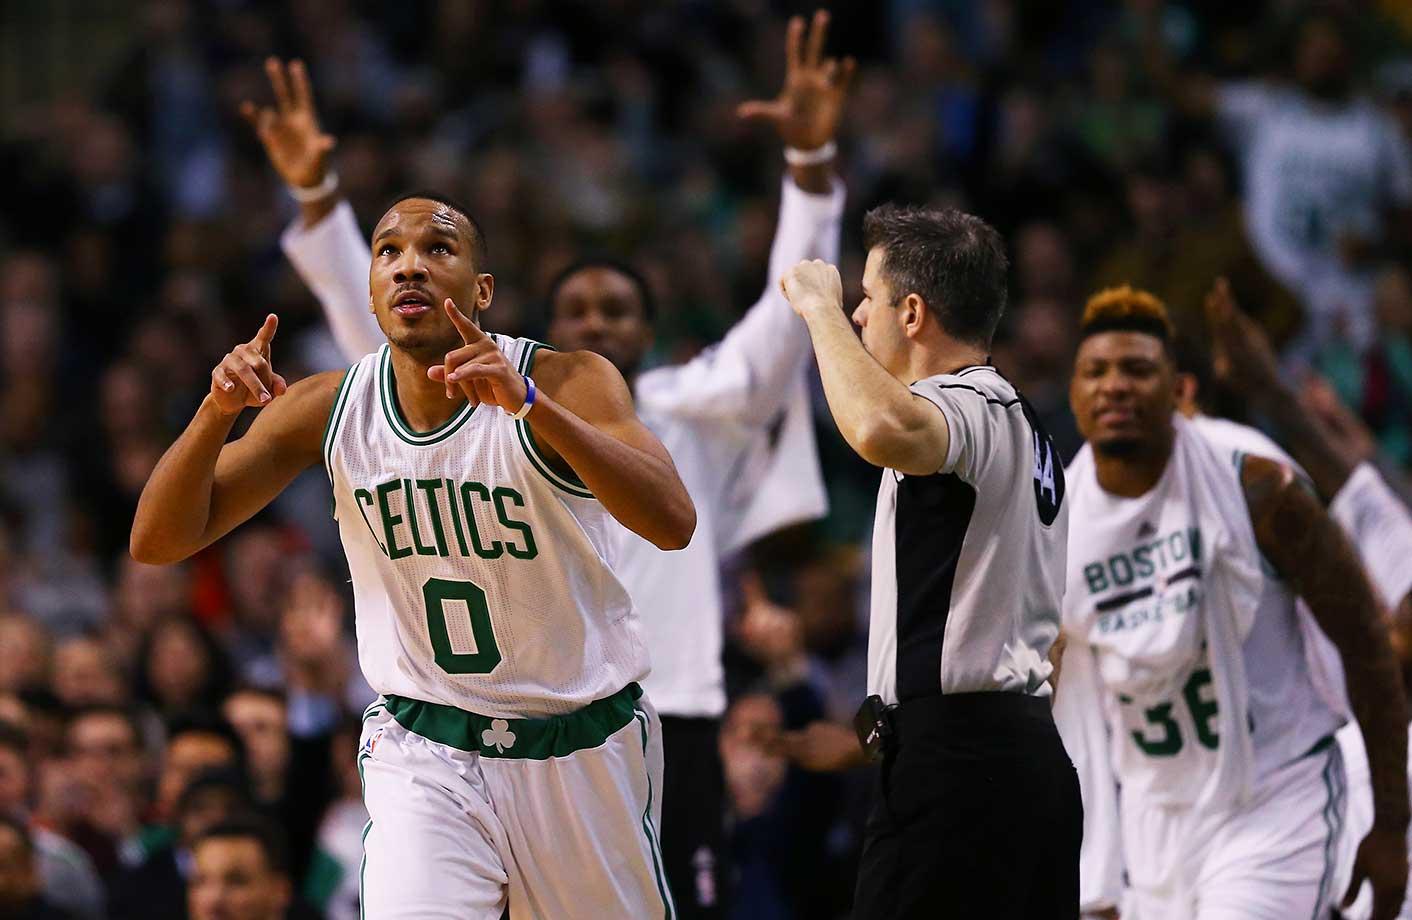 Avery Bradley of the Boston Celtics celebrates after hitting a three-point shot against Portland.